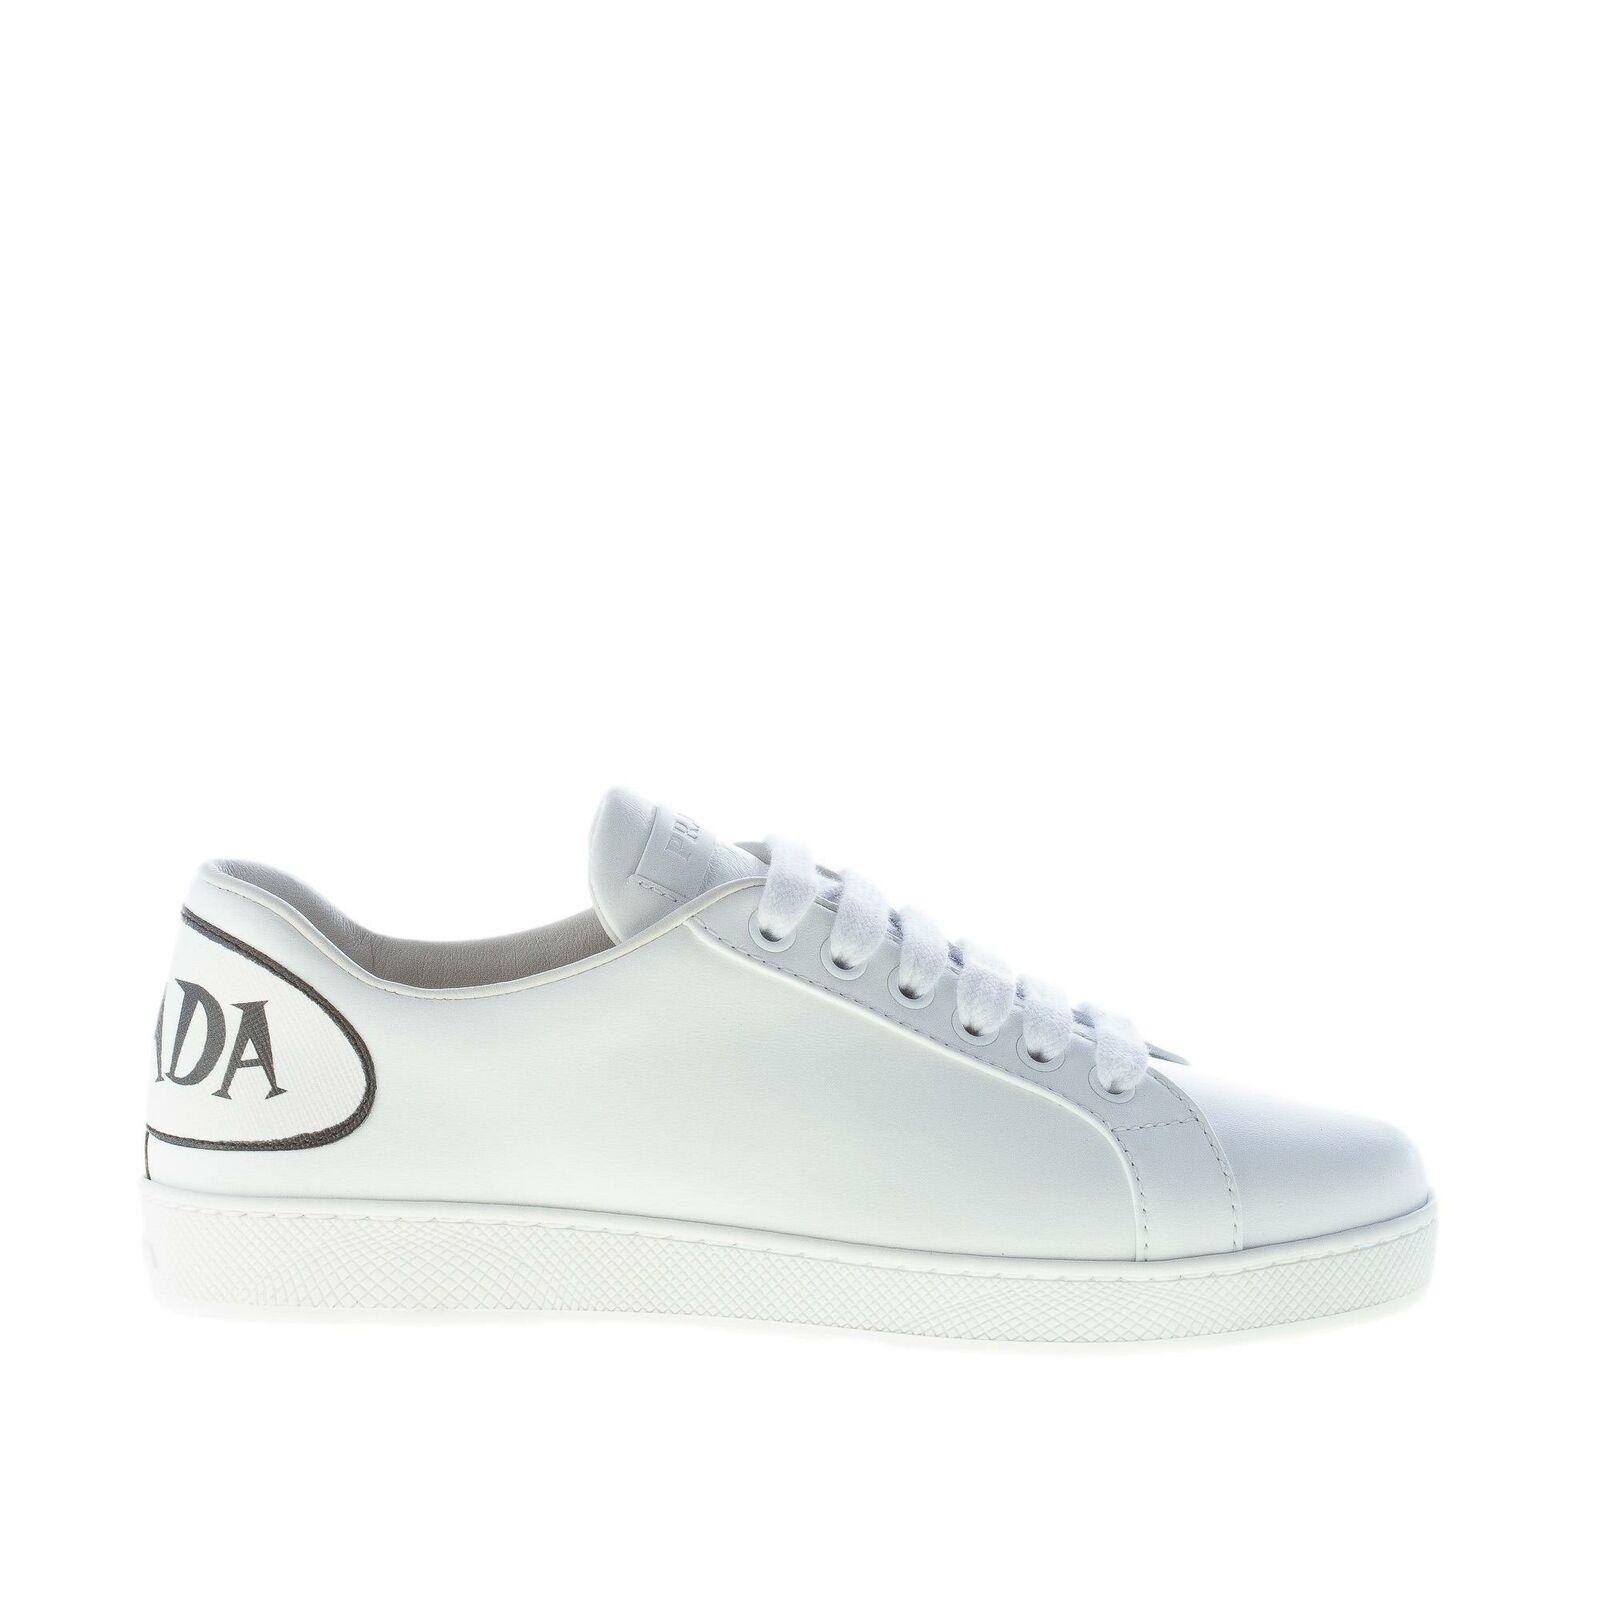 PRADA Chaussures femmes femmes femmes femmes chaussures en cuir blanc Comix baskets 1e779i 3kes f0009 e6043b